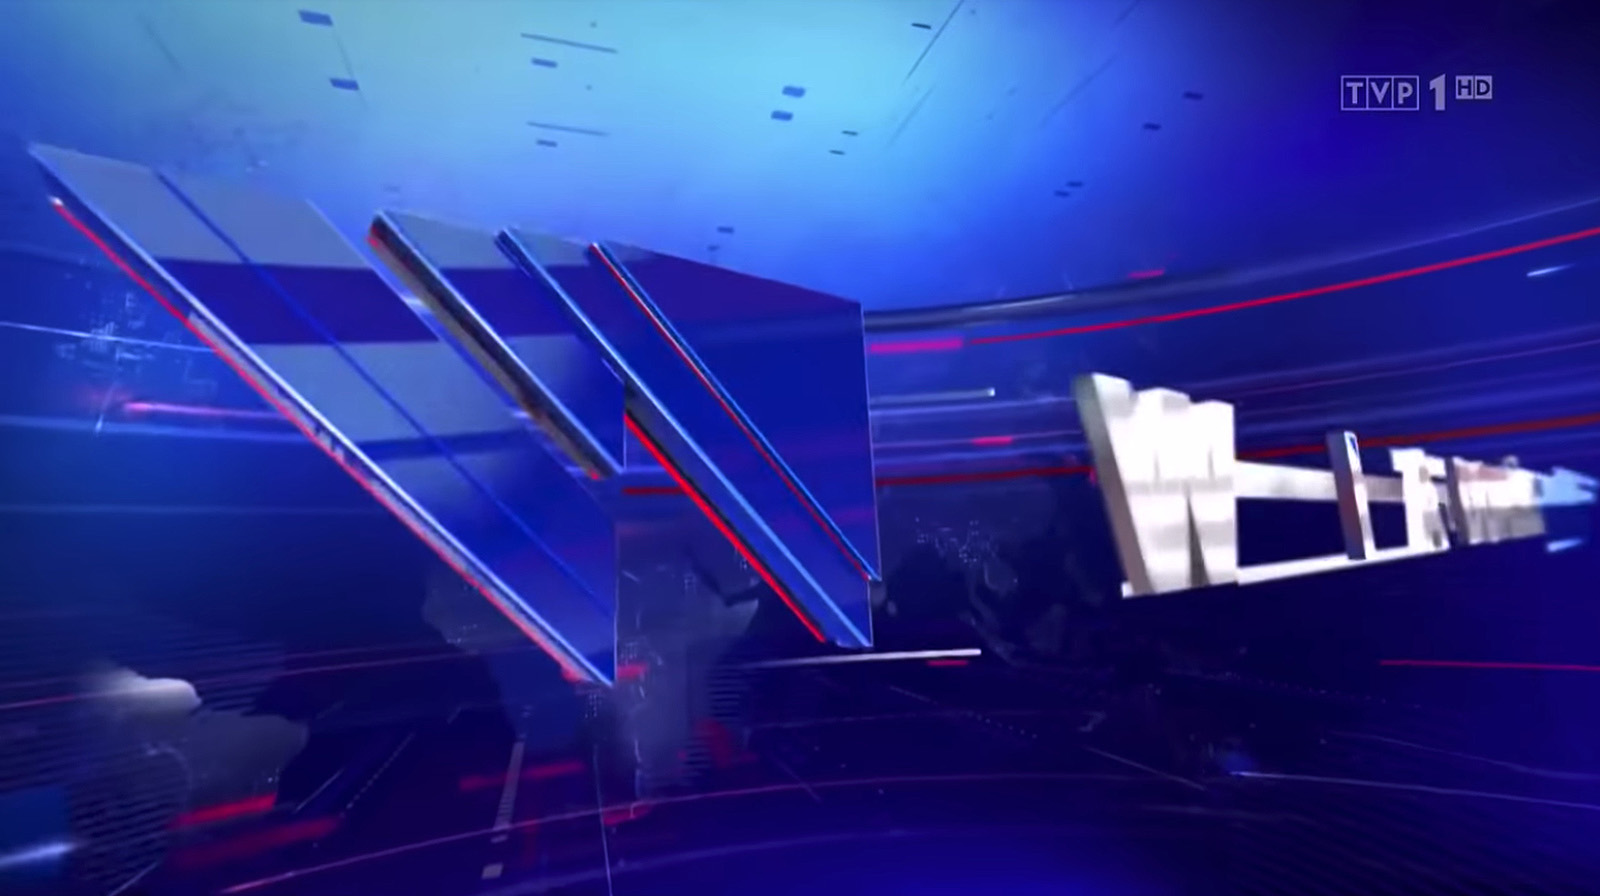 NCS_TVP1-Motion-Graphics-AR_0011